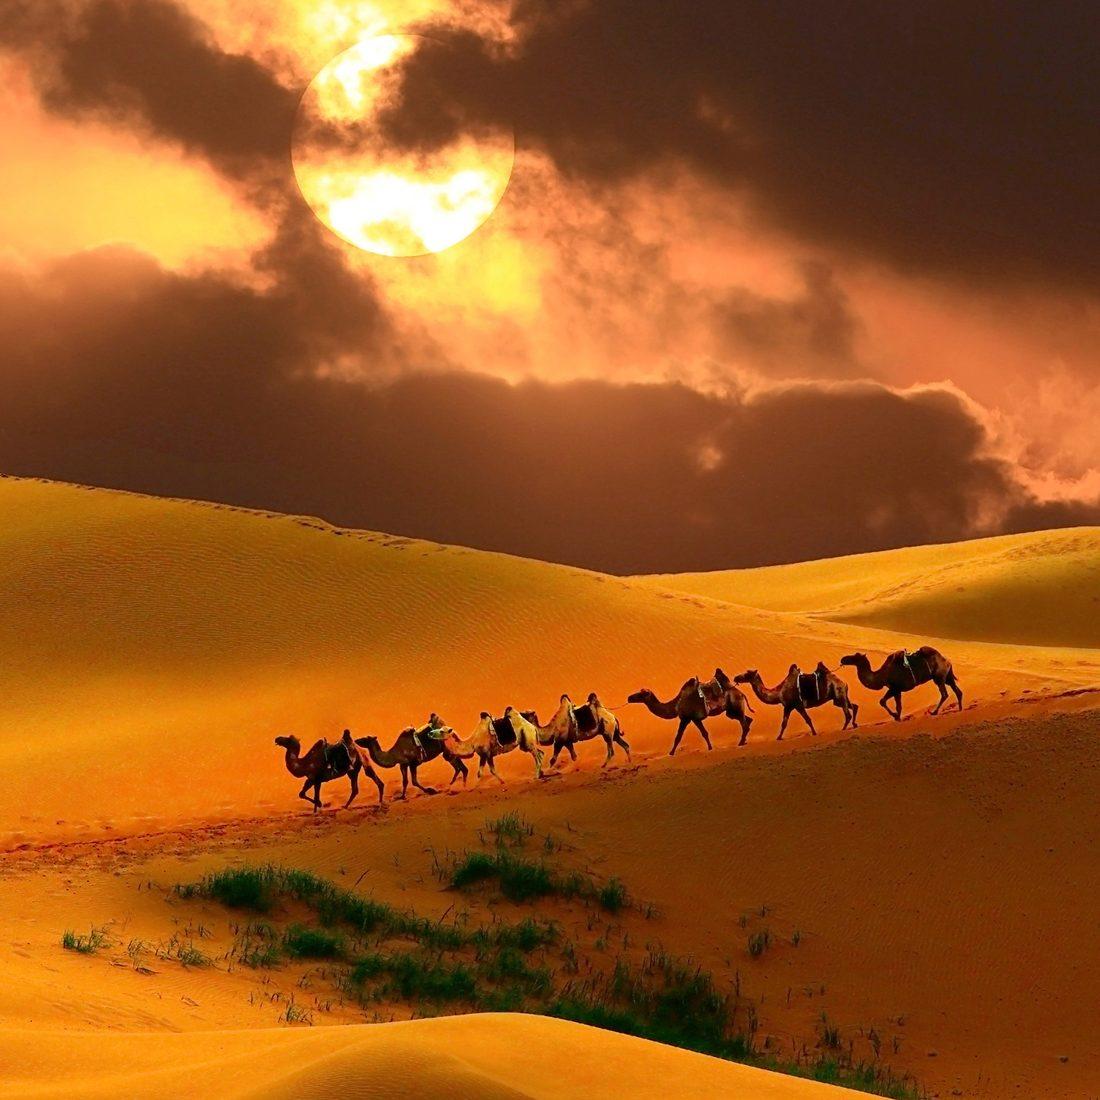 Caravan in the desert, Mongolia